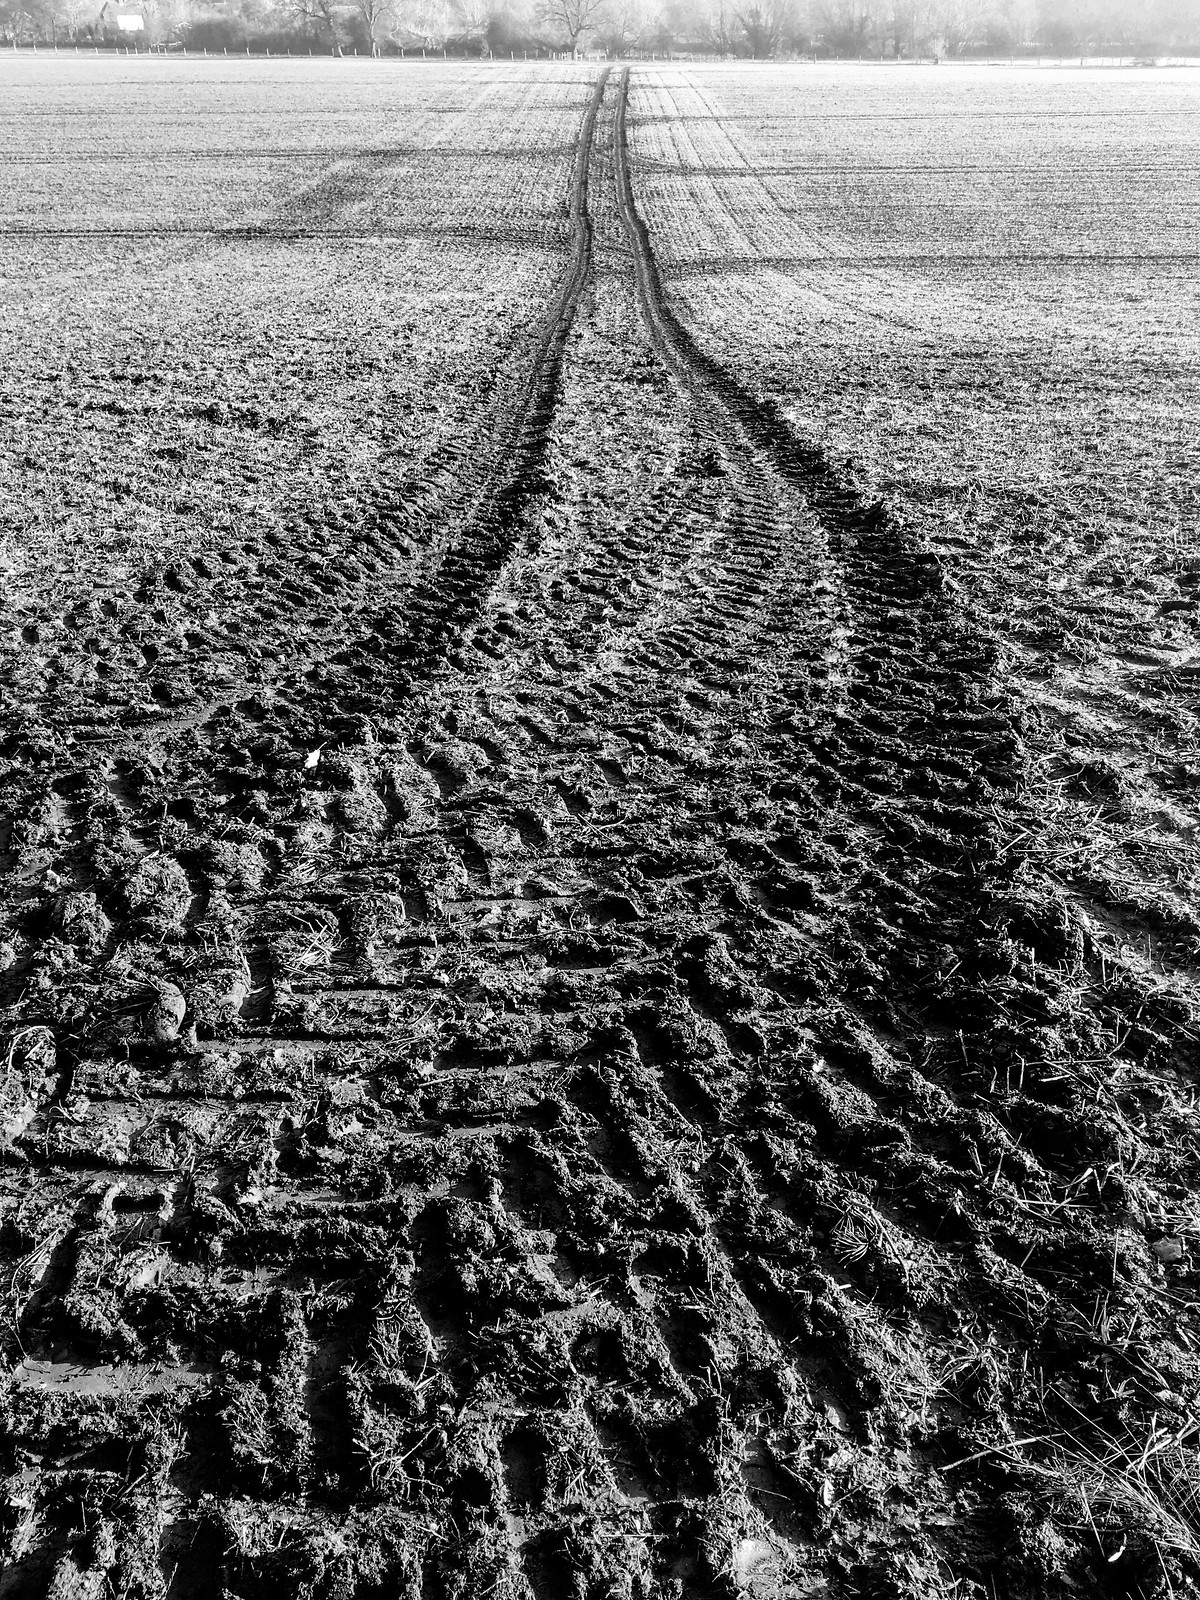 Field, mud, tracks